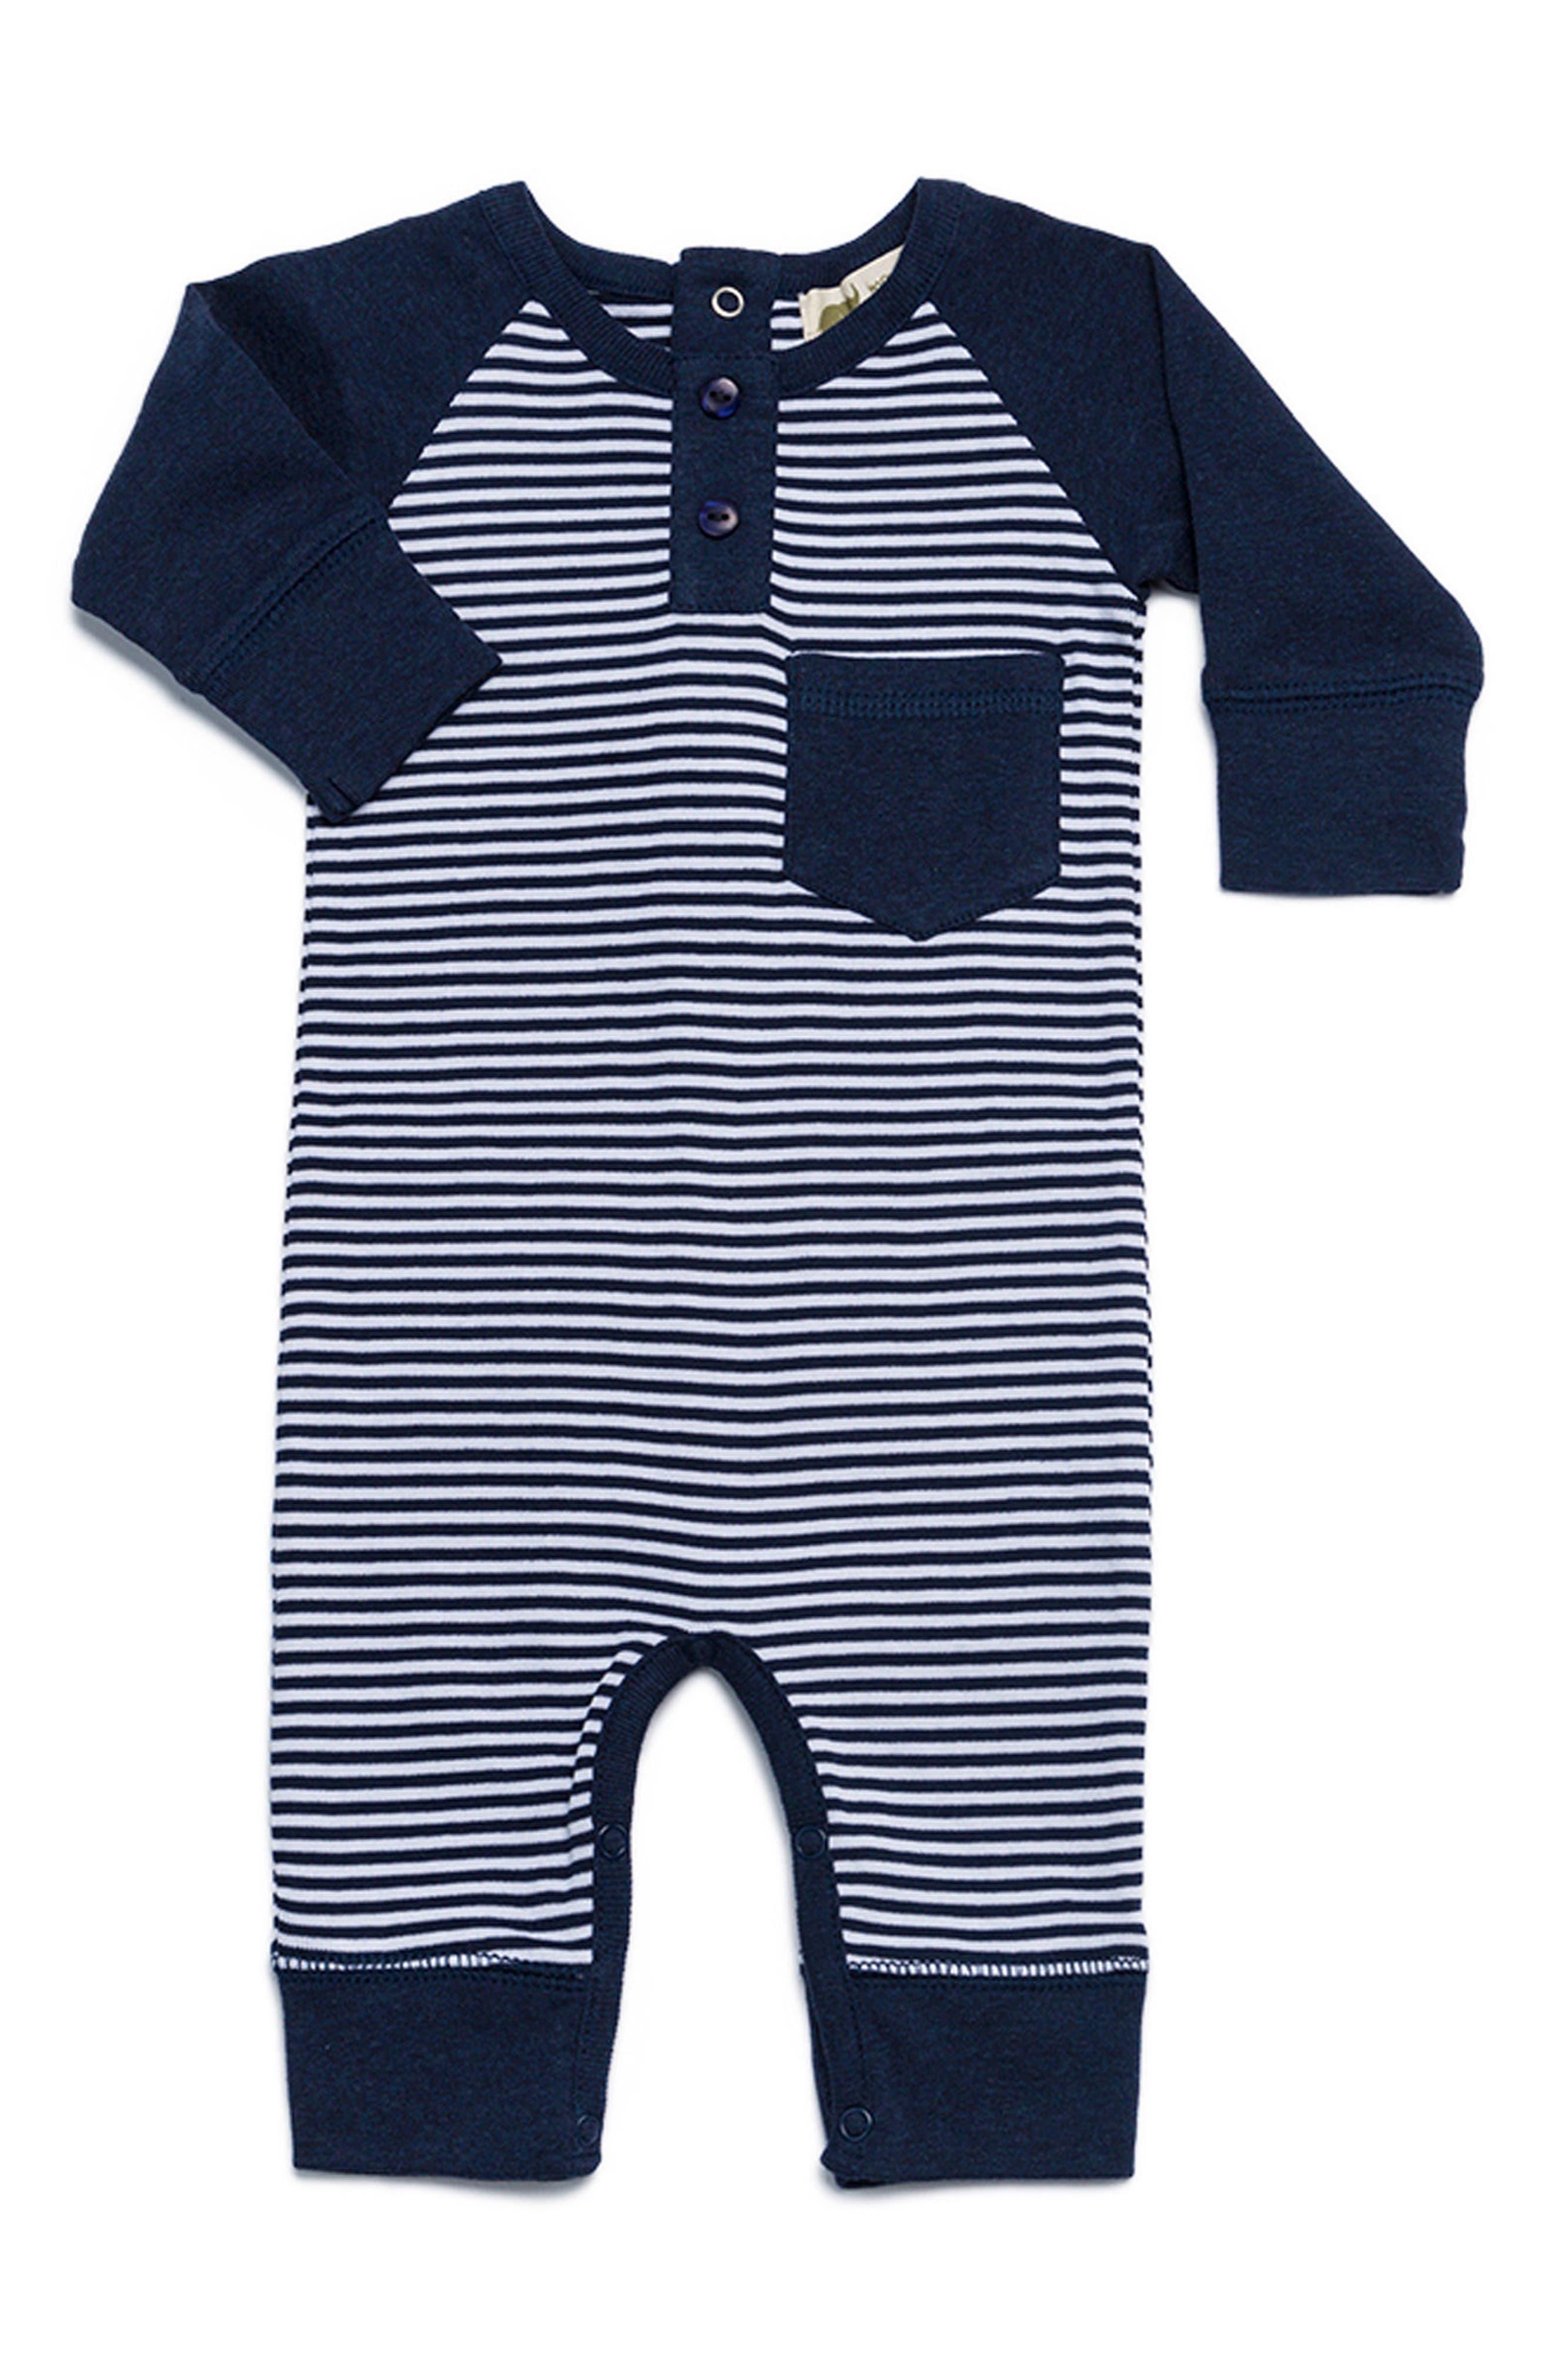 Henley Organic Cotton Romper,                         Main,                         color, Navy Blue X White Stripe